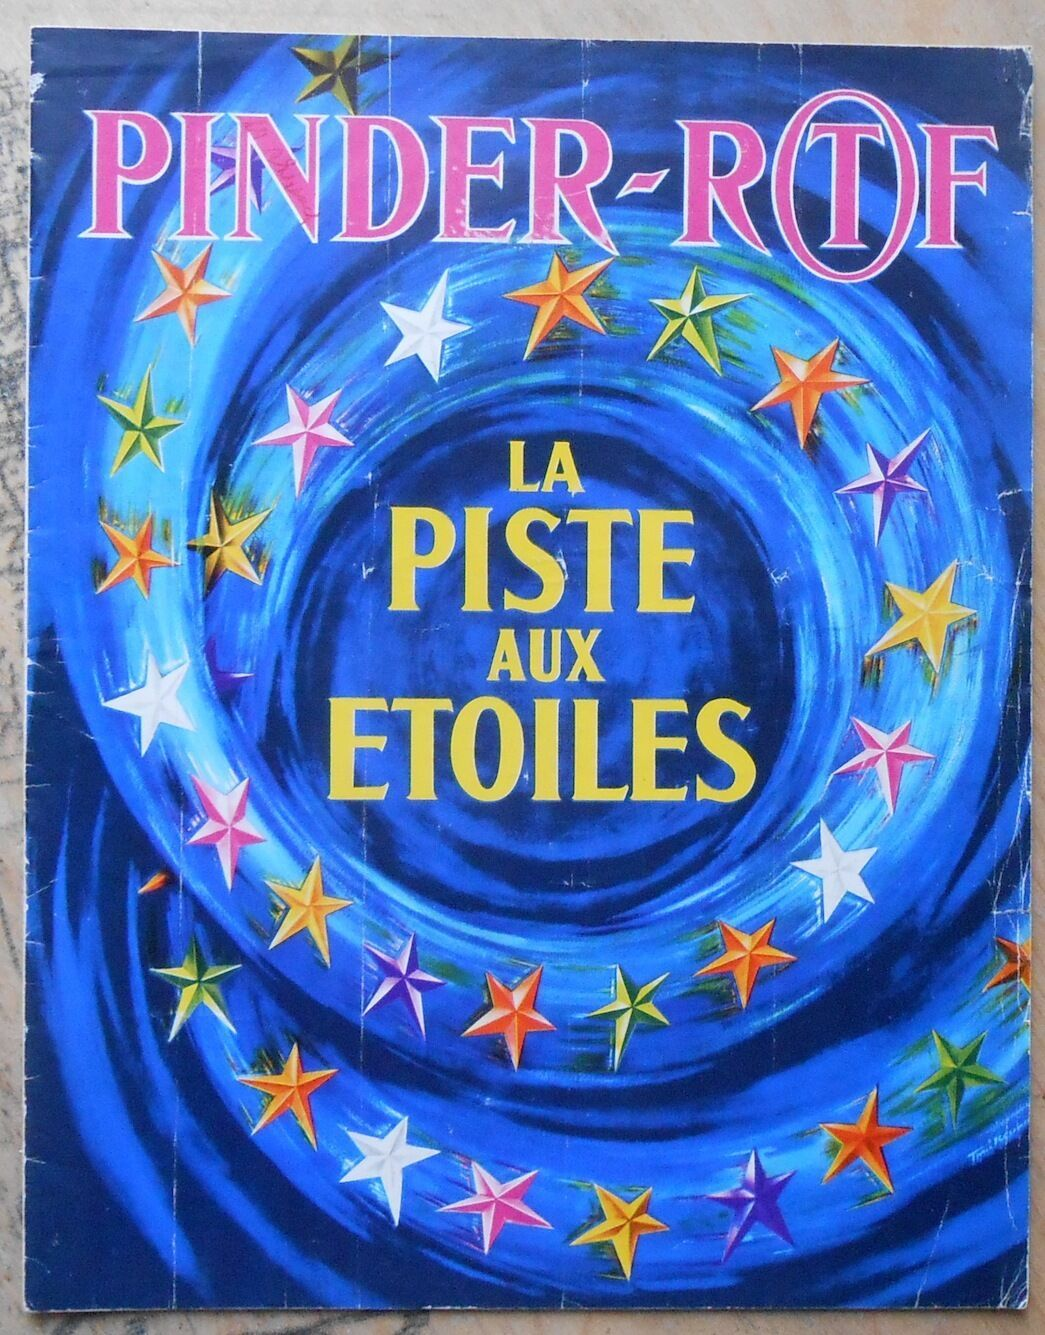 Programme Du Cirque Pinder Ortf La Piste Aux Etoiles Ebay Cirque Ebay Programming